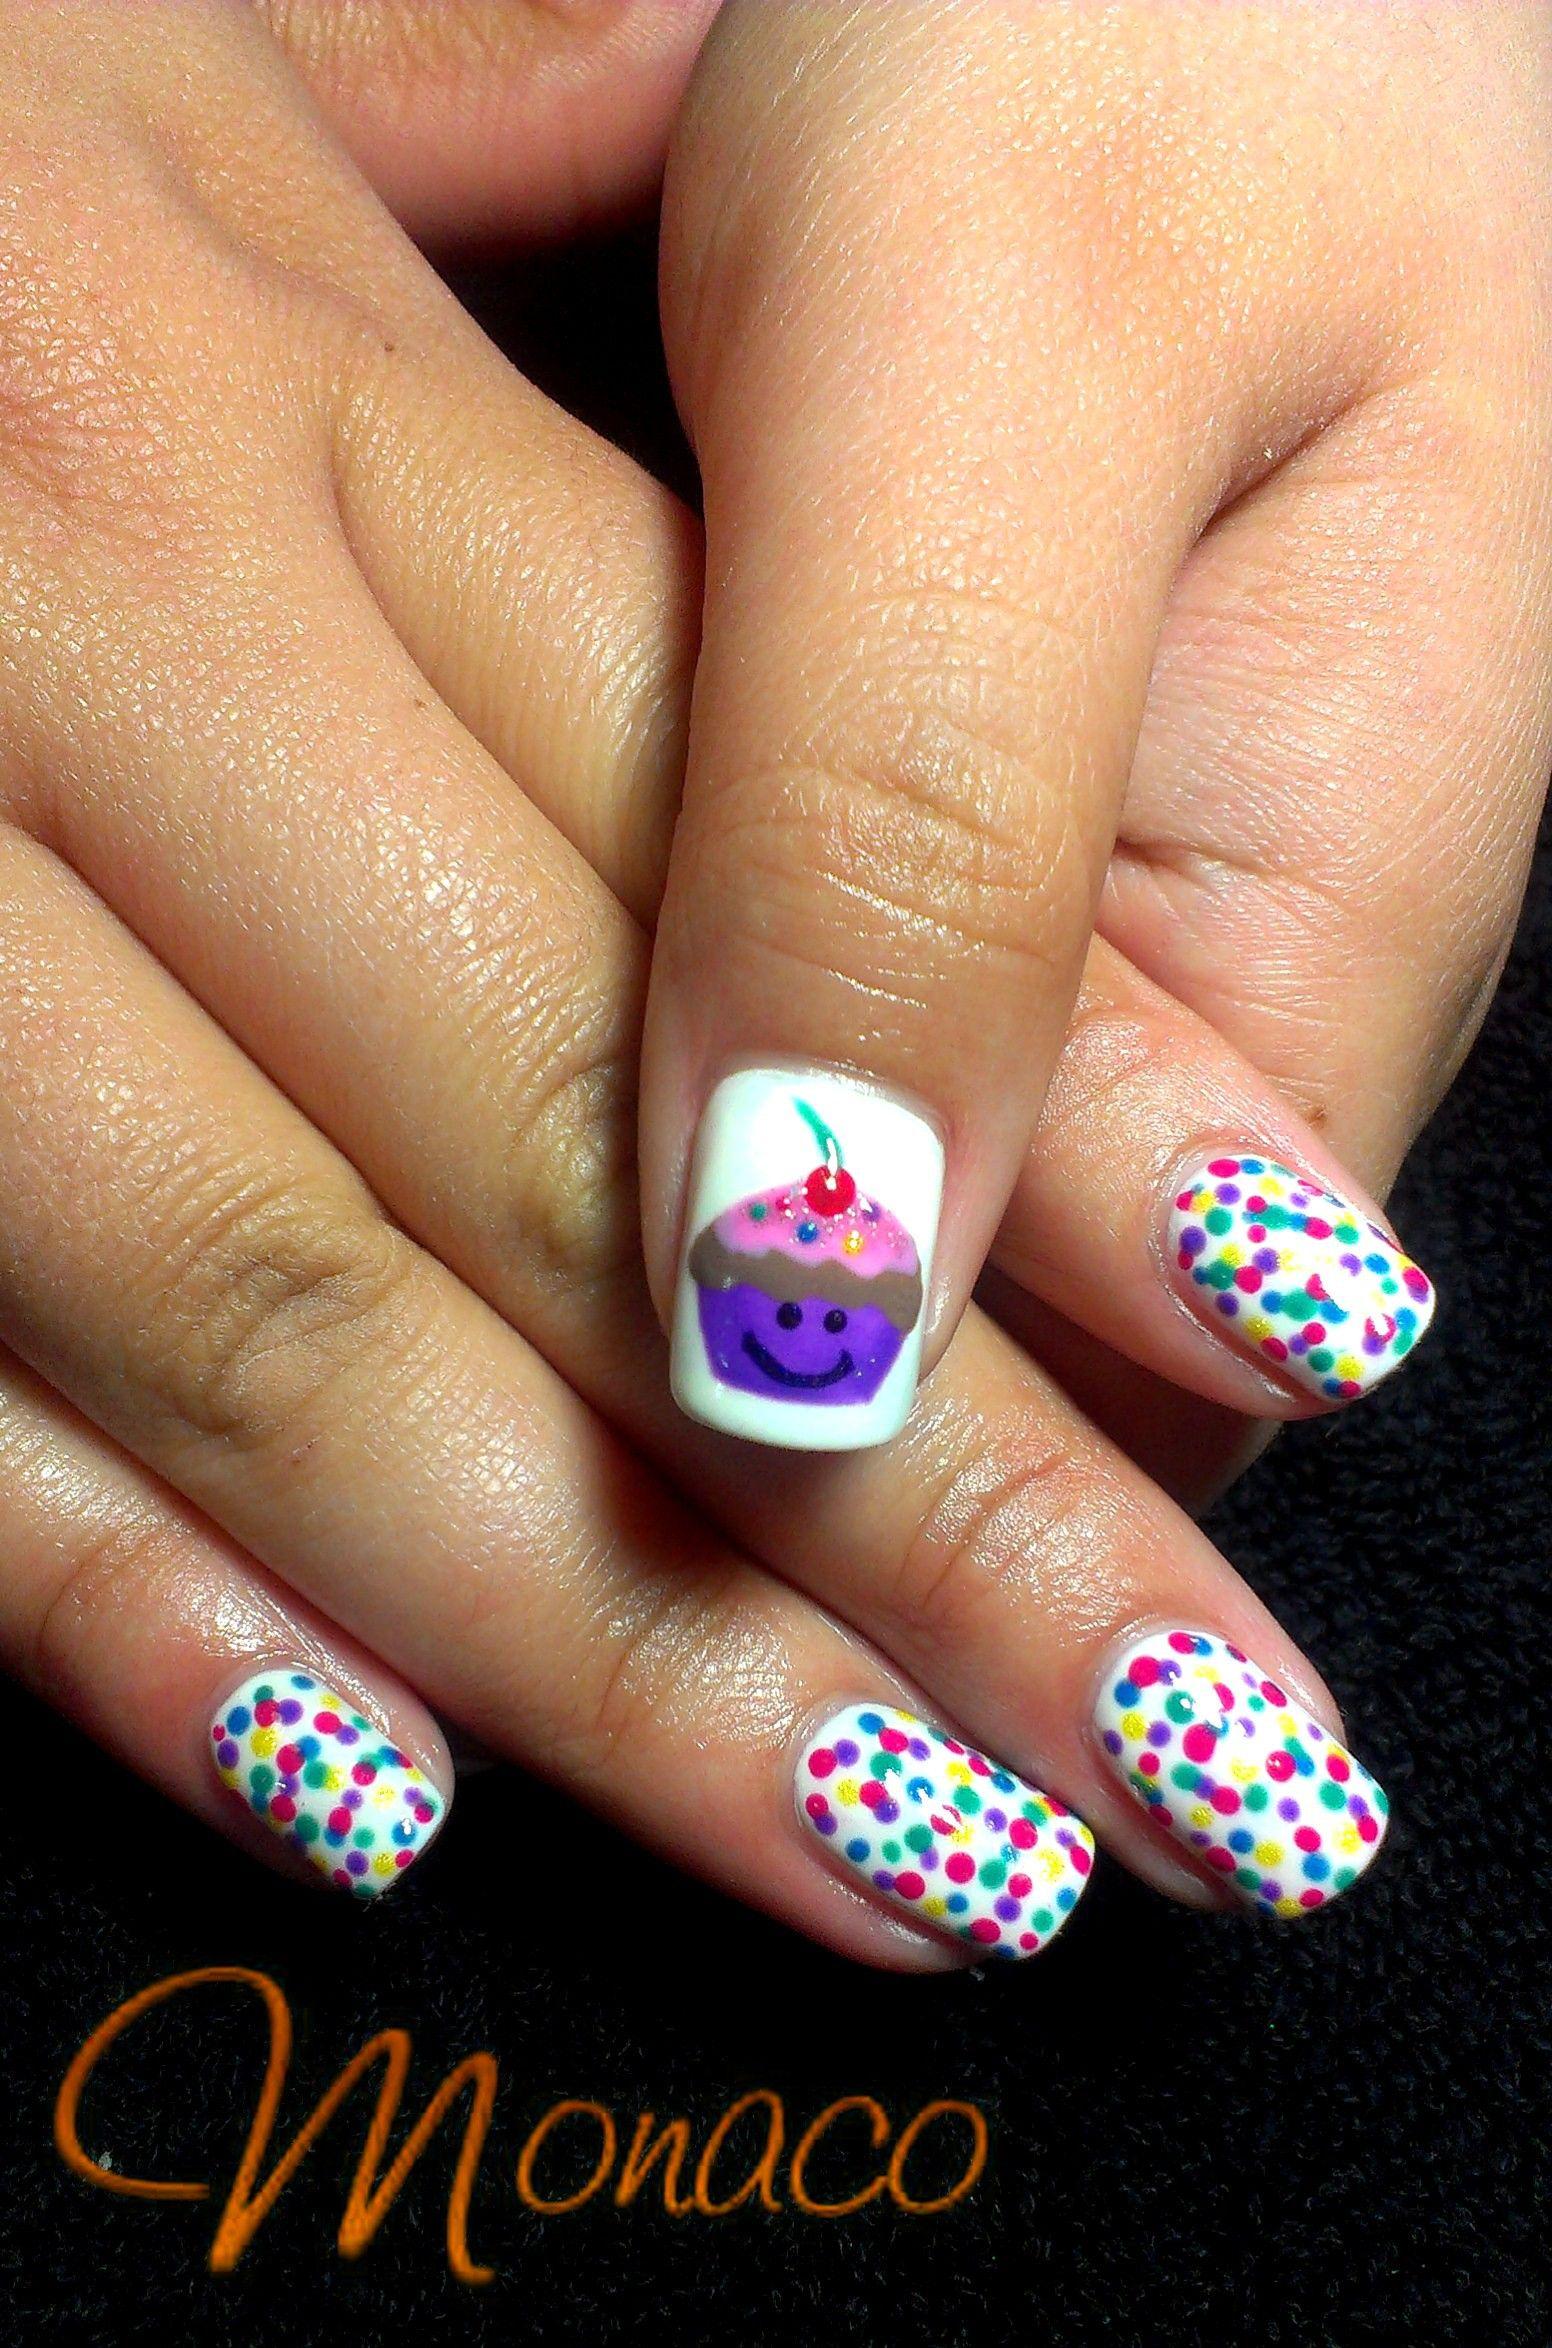 NailArt Love Cupcake Colourful Sprinkles